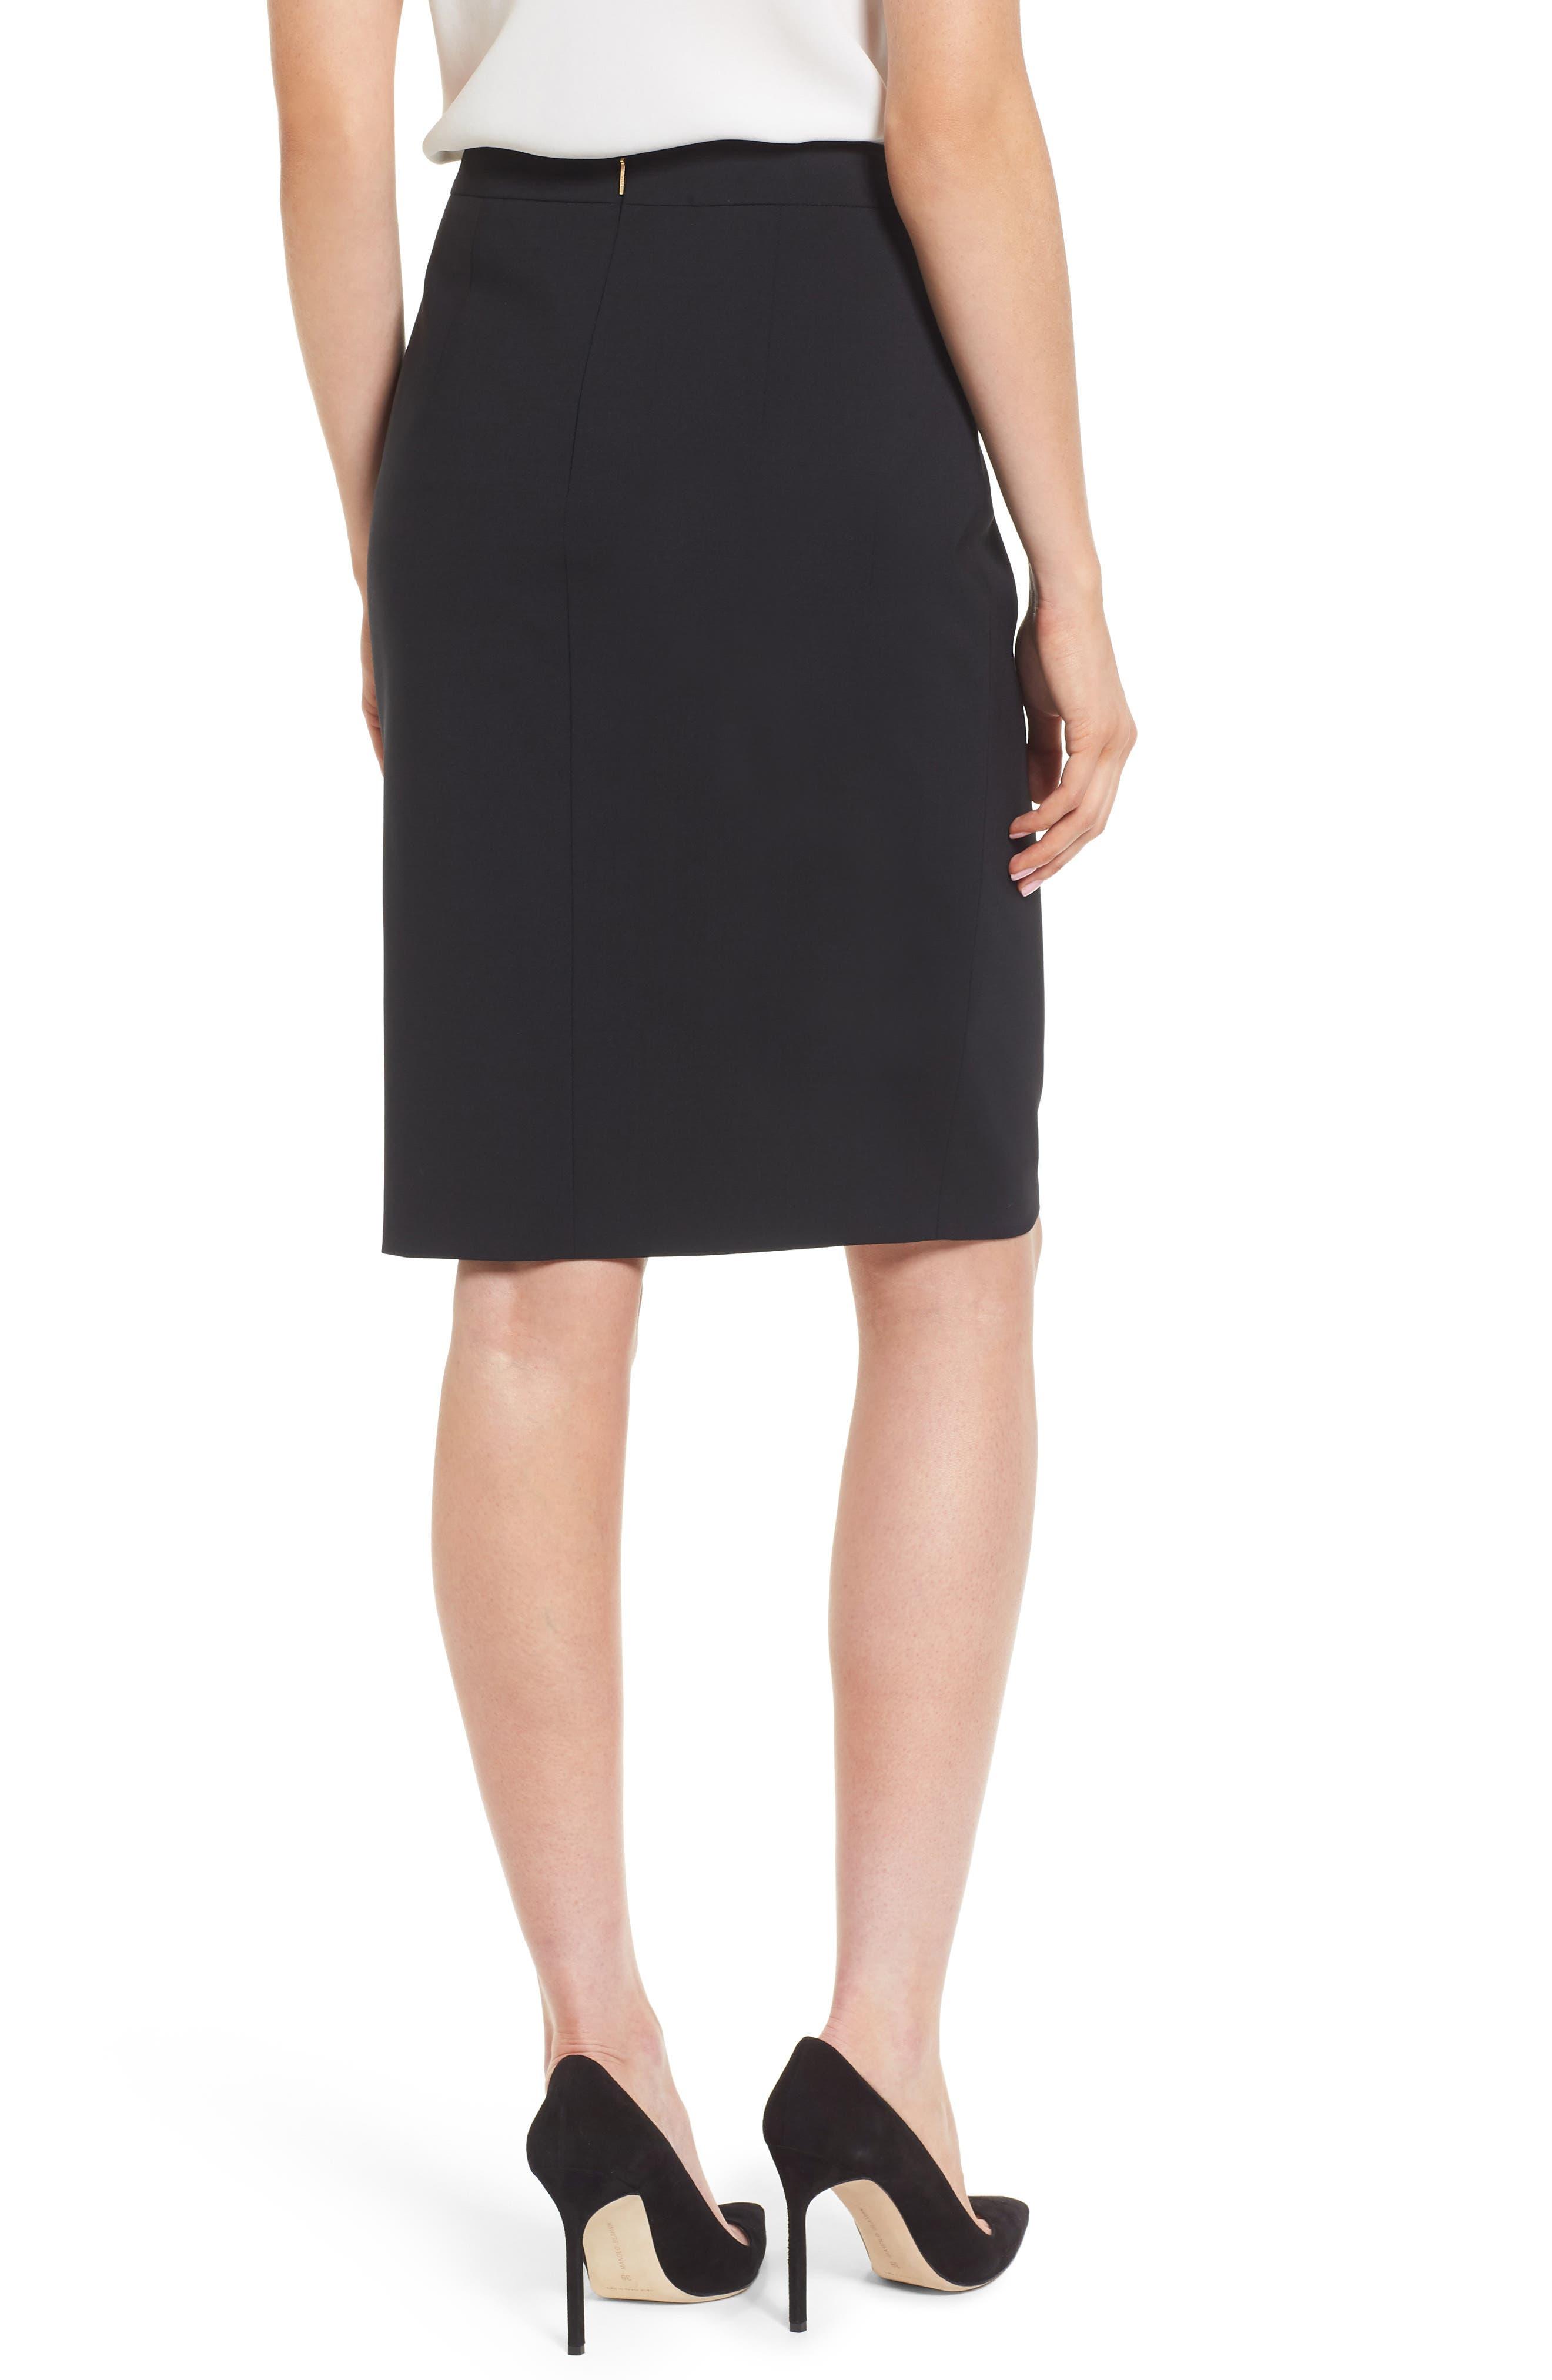 Volania Stretch Wool Pencil Skirt,                             Alternate thumbnail 2, color,                             BLACK